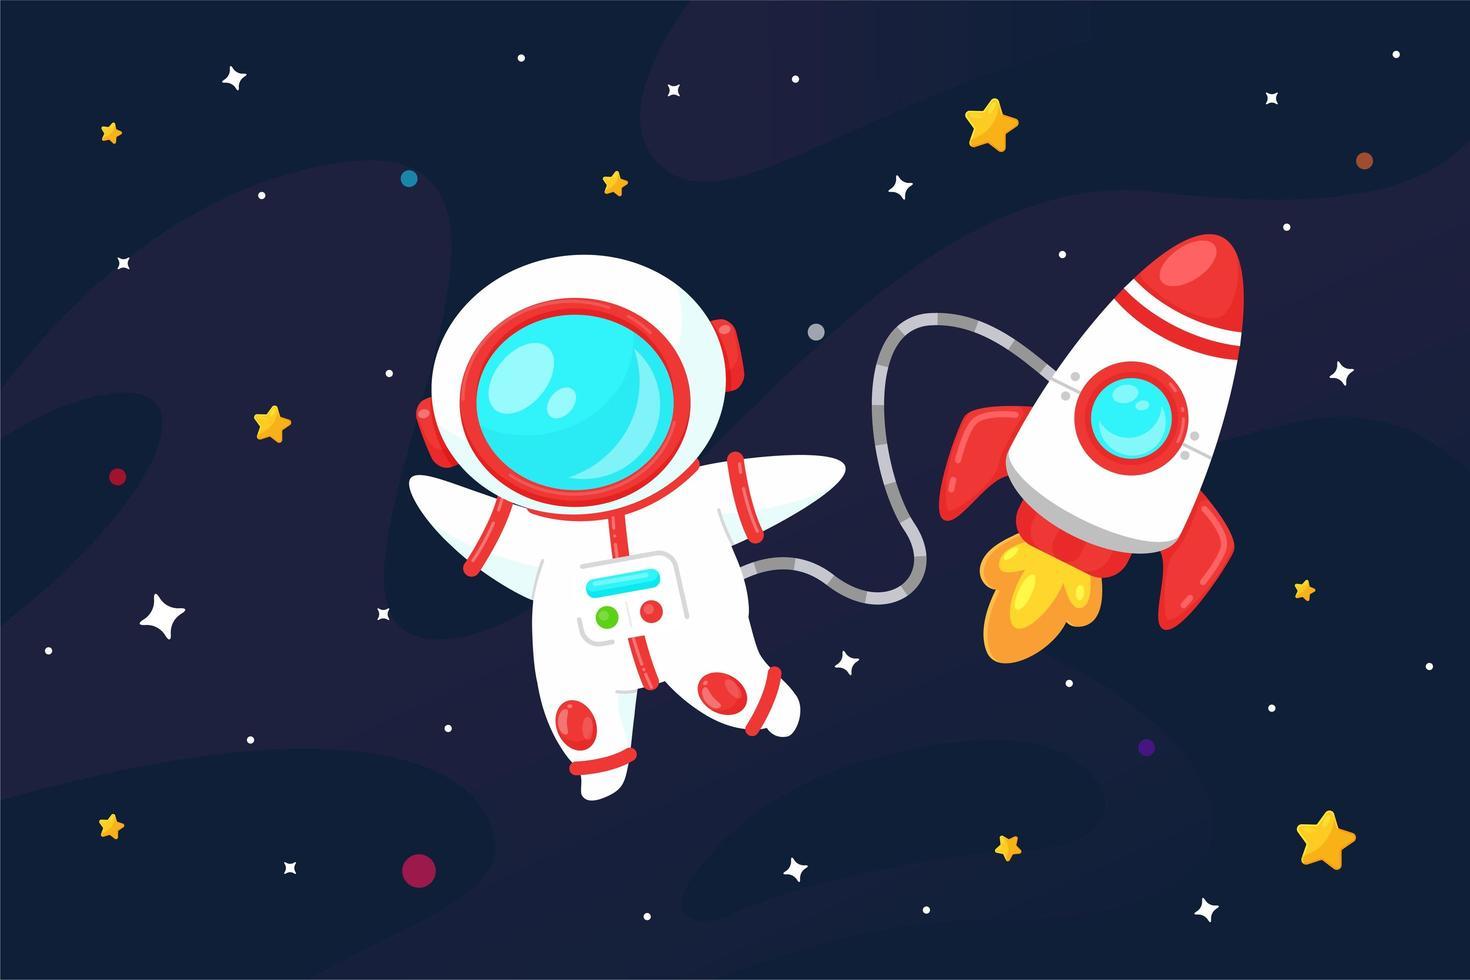 astronaut med ett rymdskepp vektor